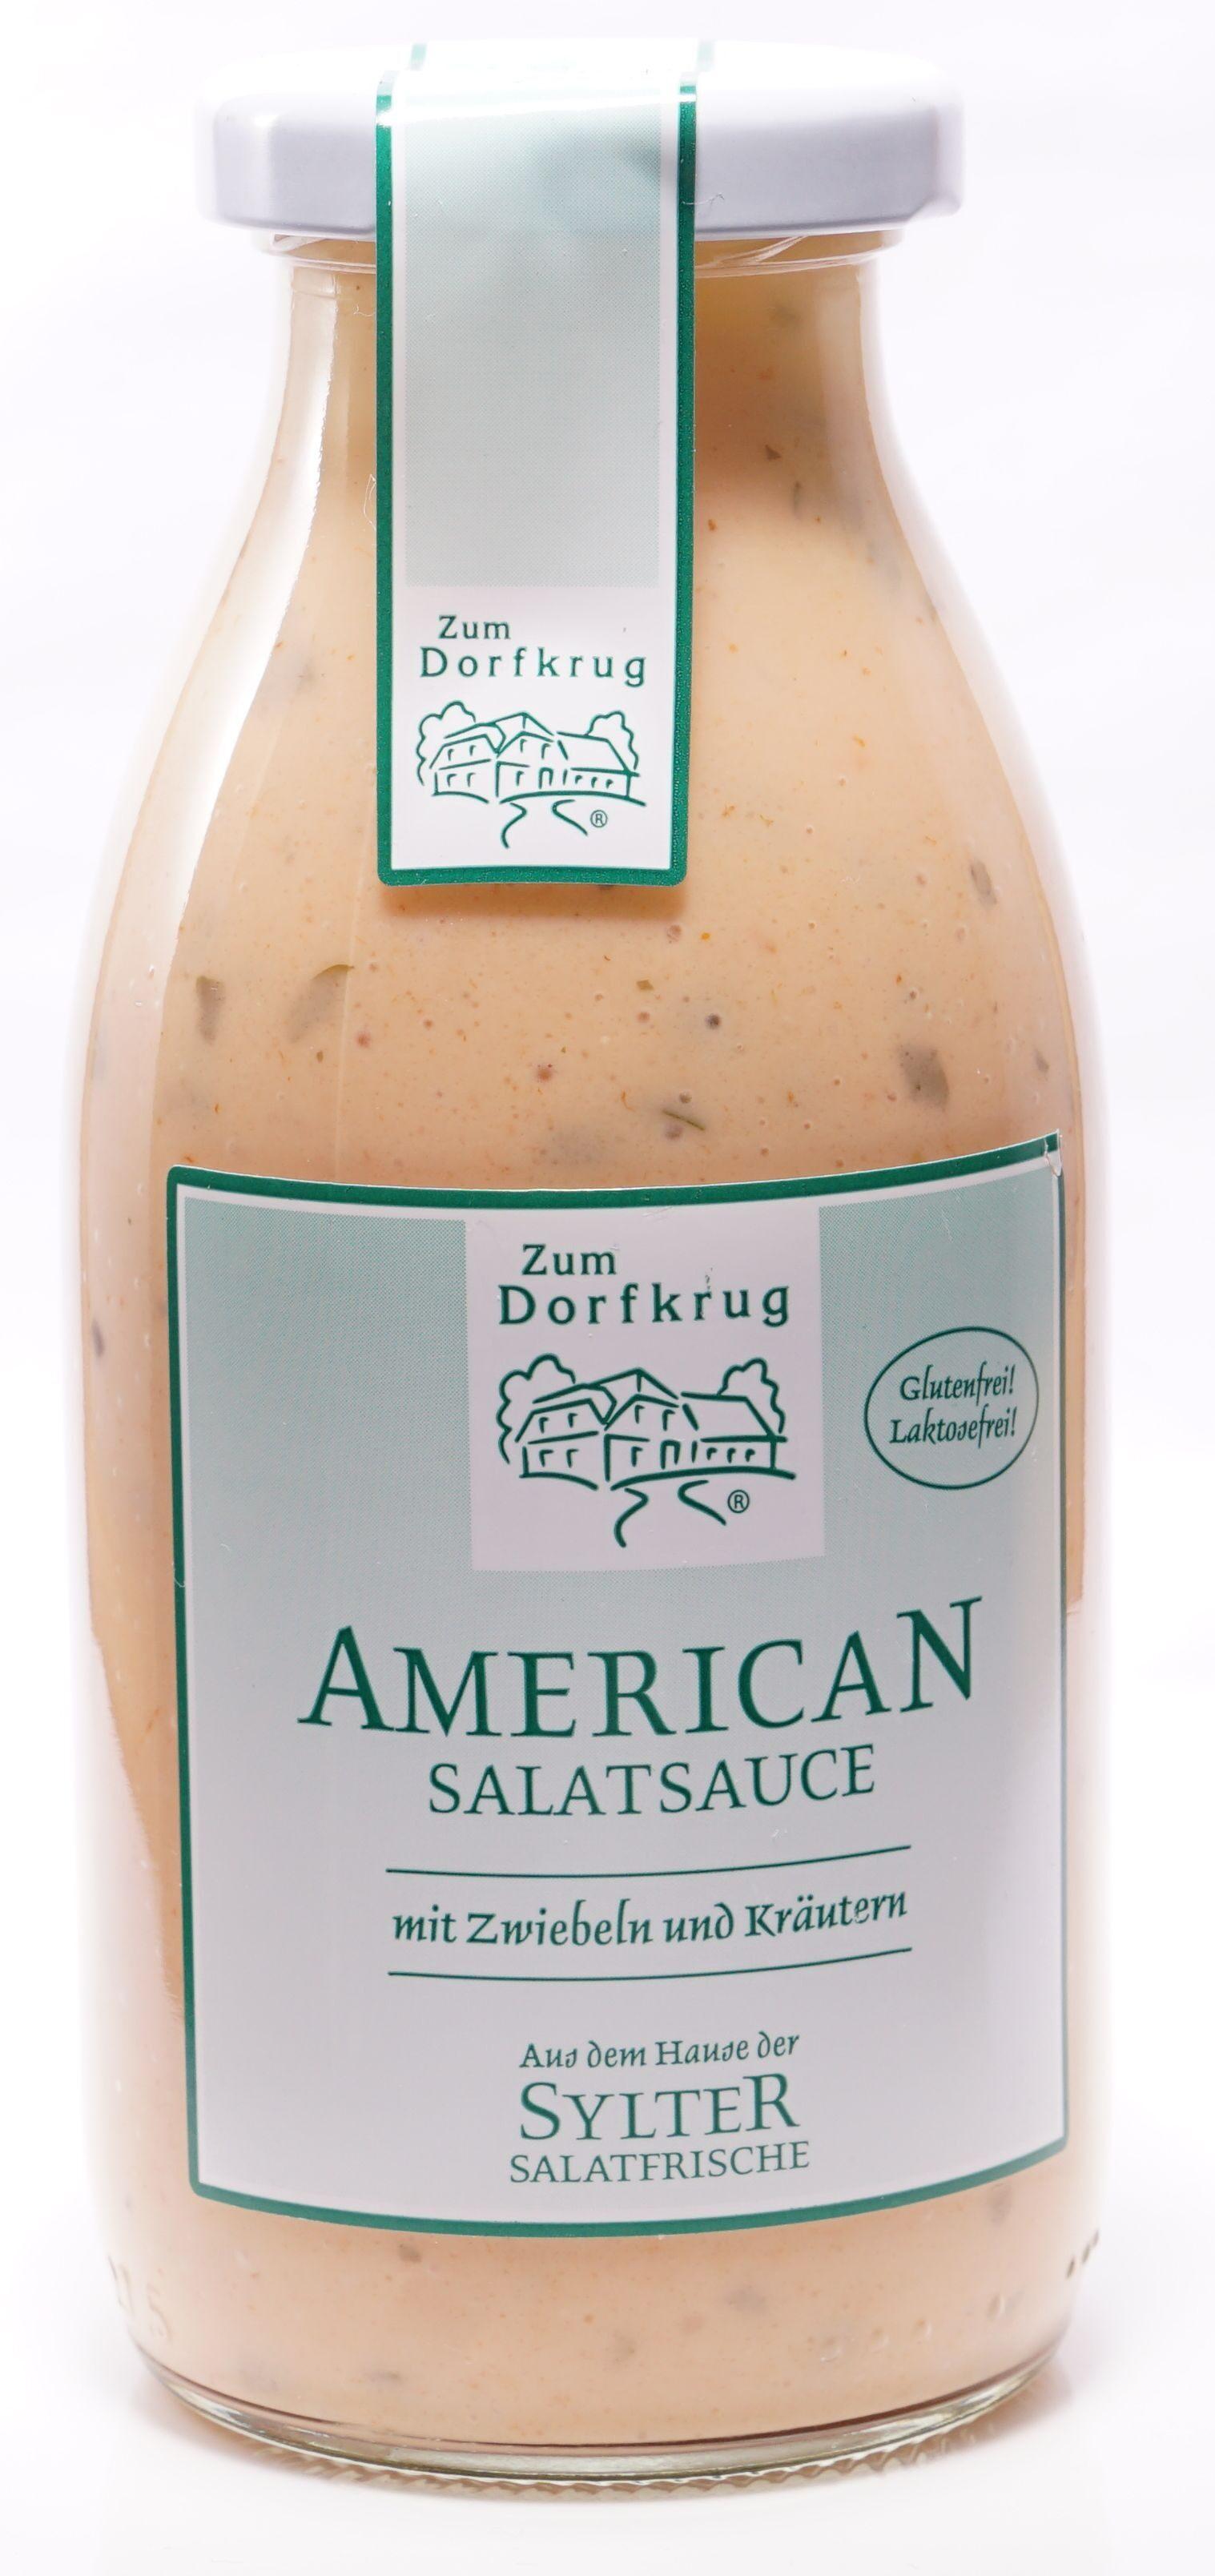 American Salatsauce, Aus dem Hause der Sylter Sala... - Prodotto - de